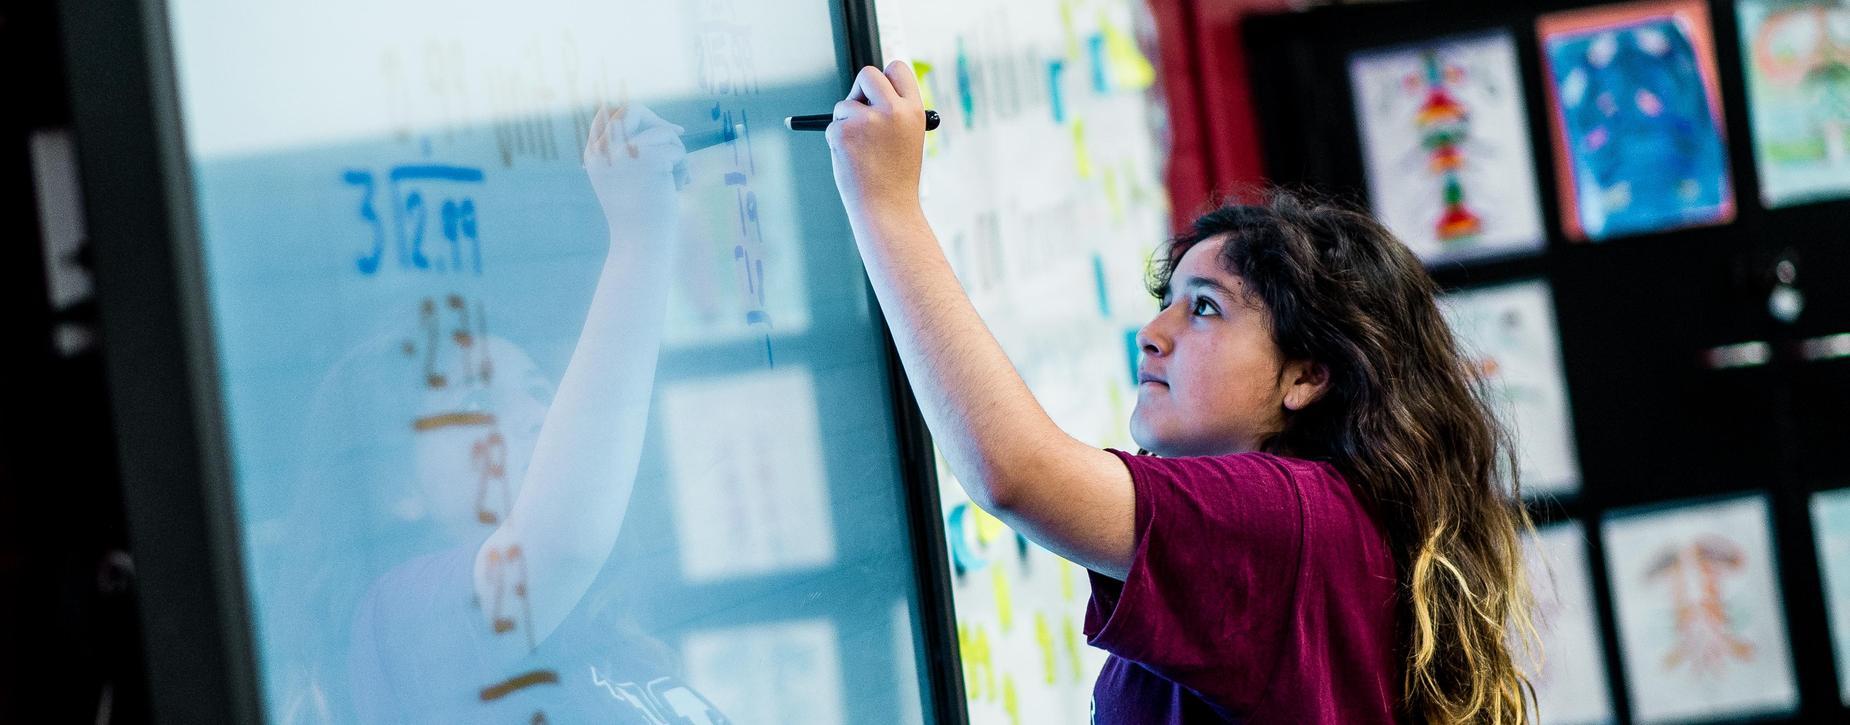 Girl using interactive board